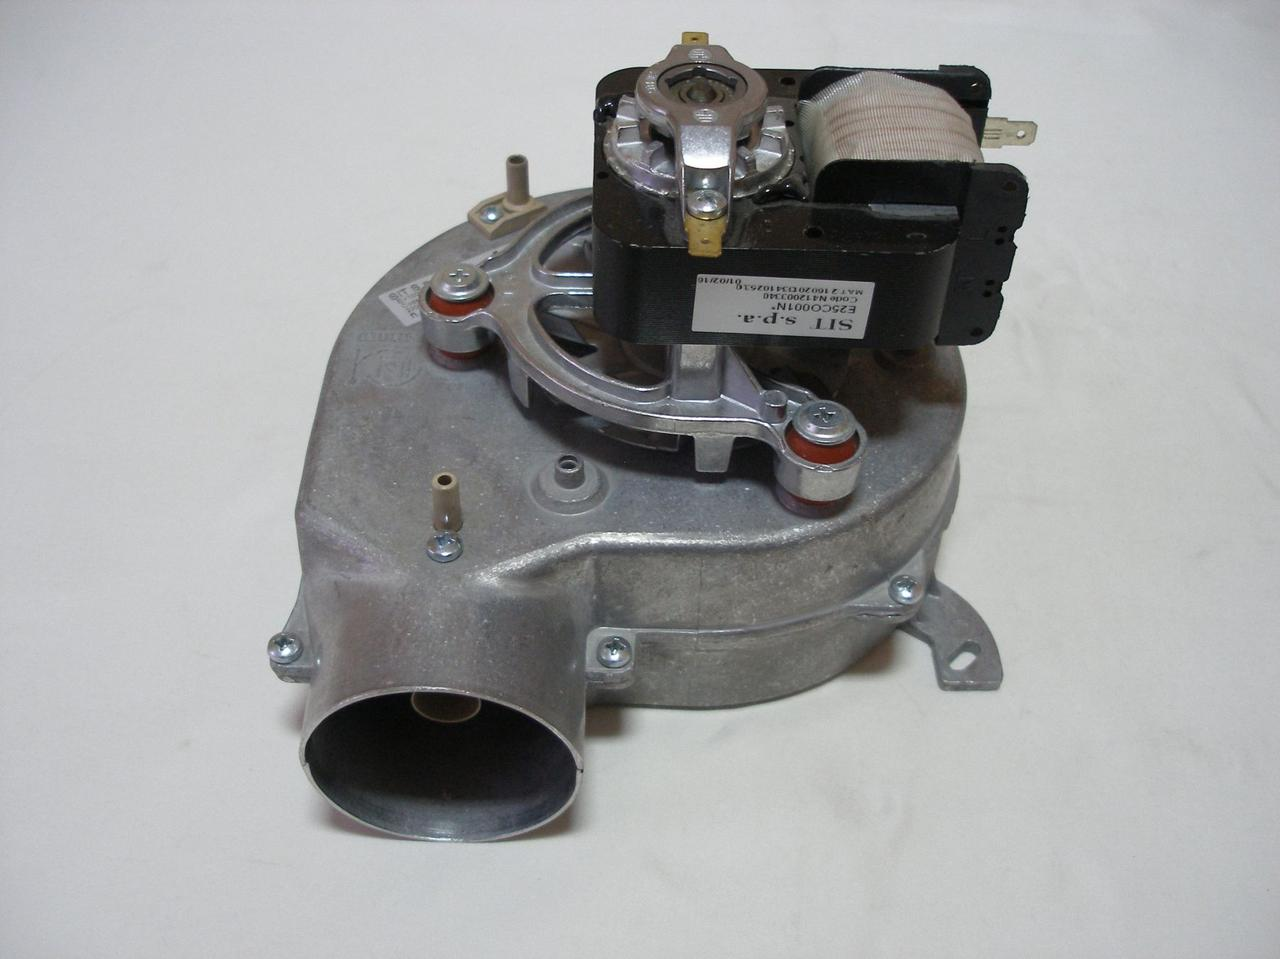 Вентилятор (турбина) 55 W